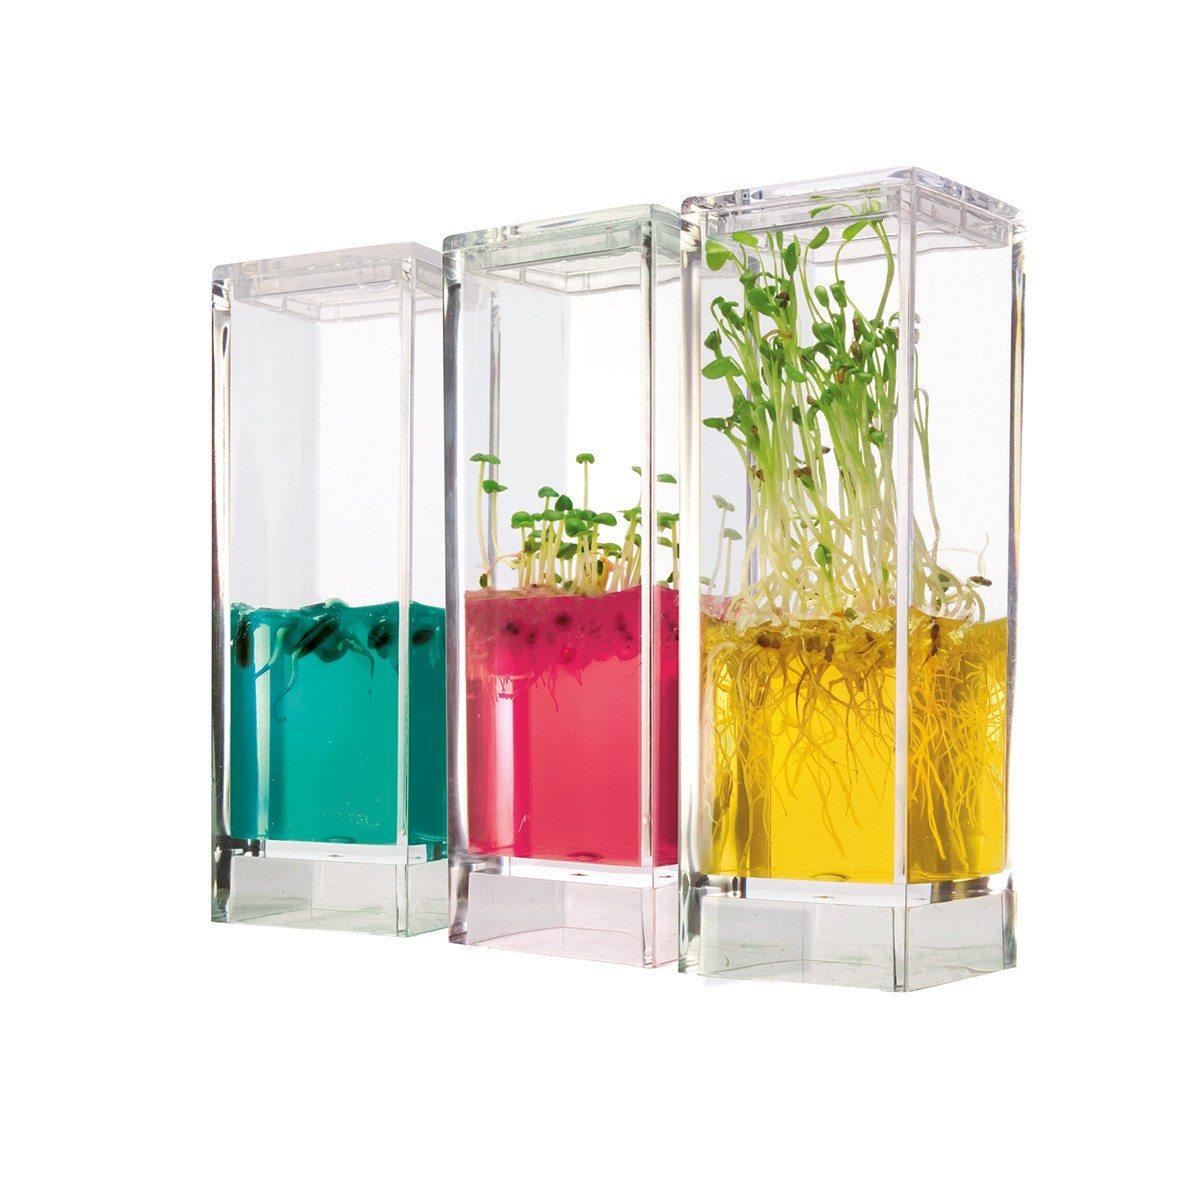 Plantenlaboratorium met gel